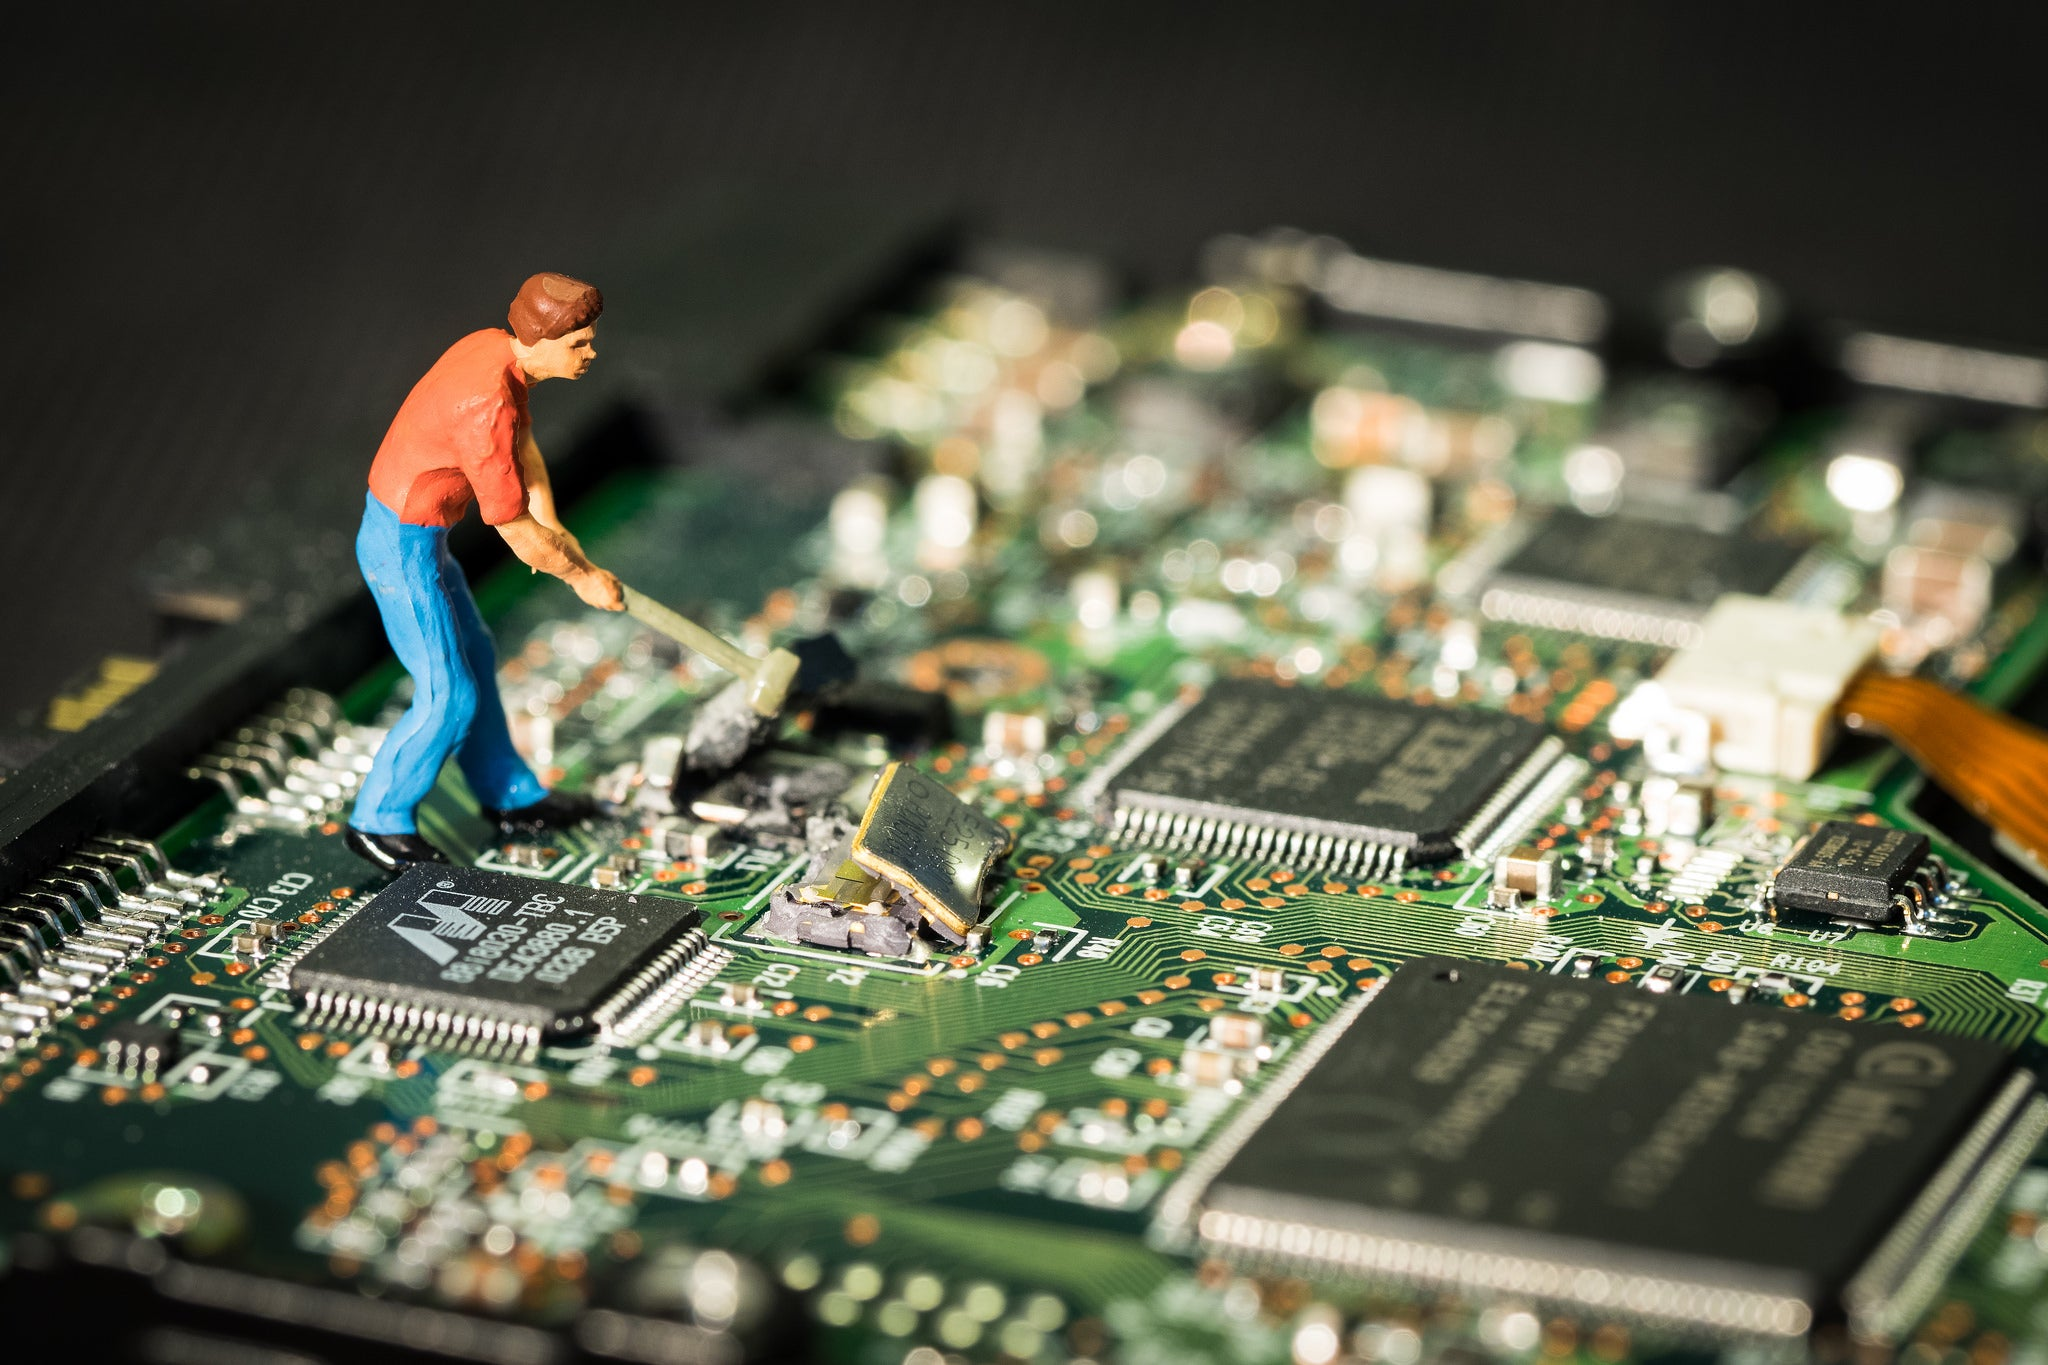 A Hacker Infiltrating A Computer